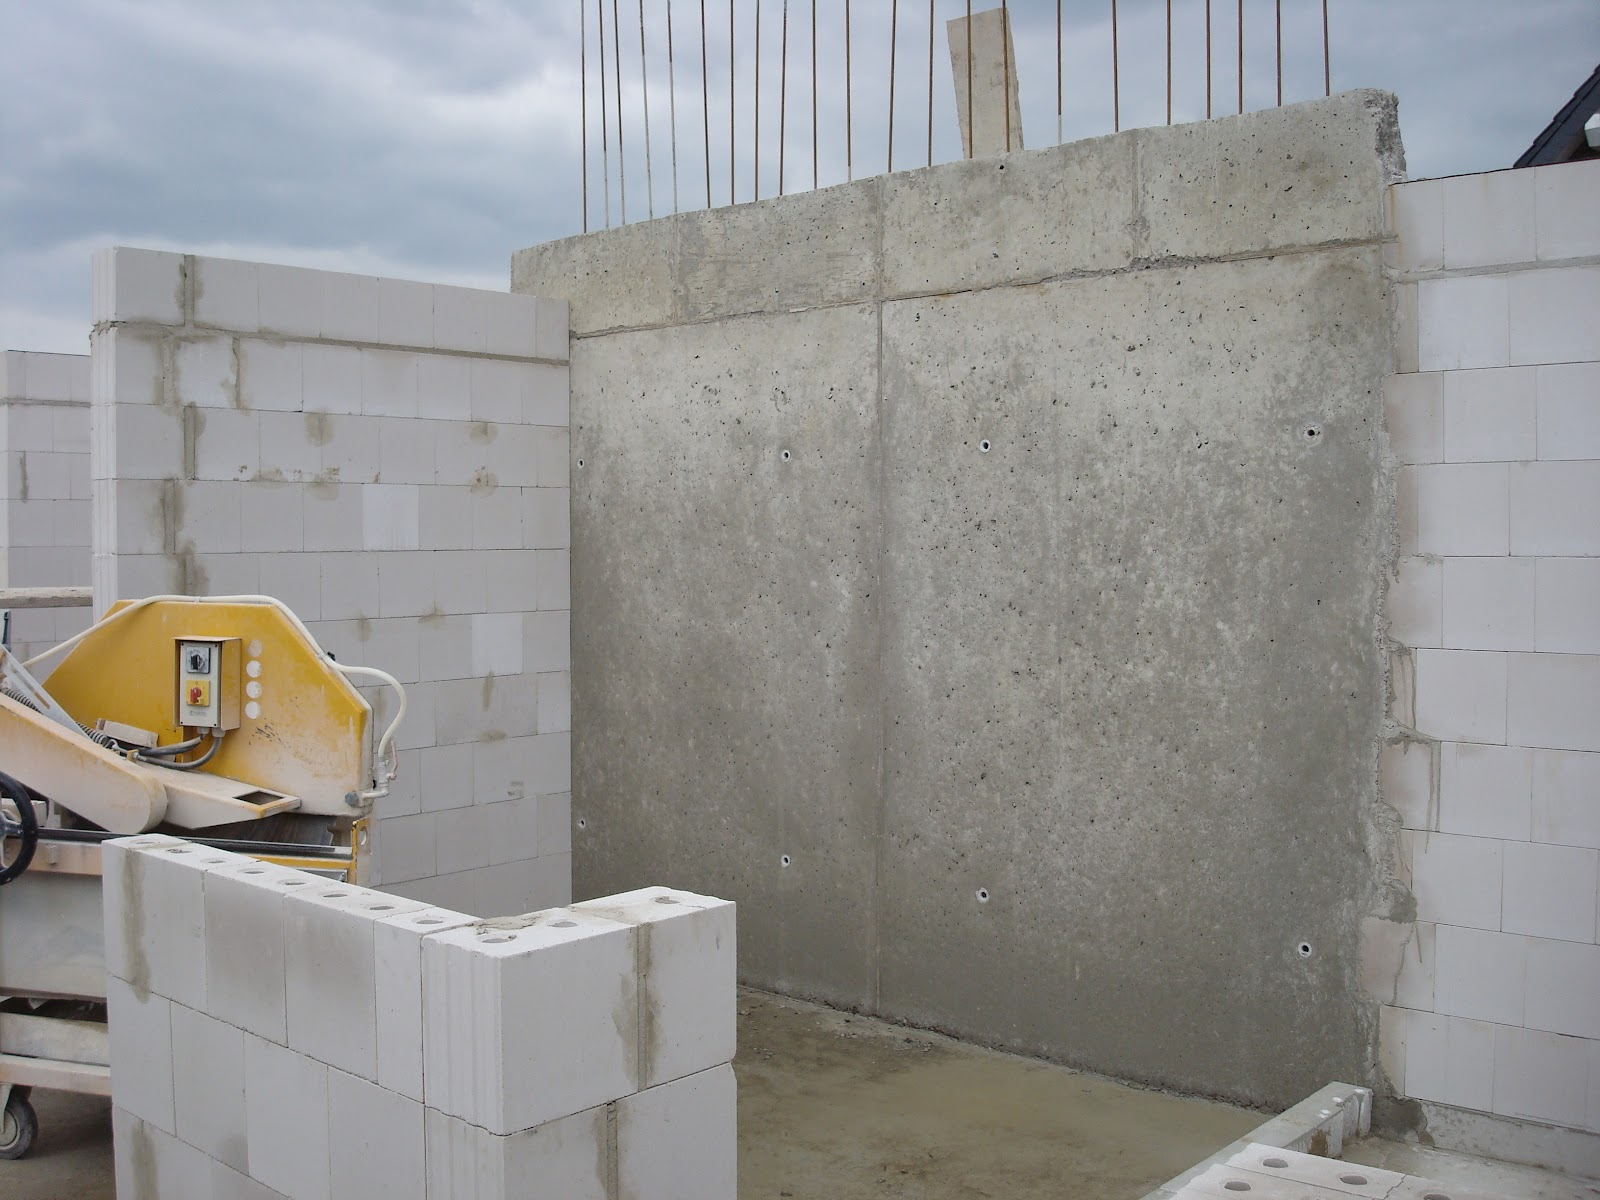 muimui haus betonwand nach 2 tagen. Black Bedroom Furniture Sets. Home Design Ideas